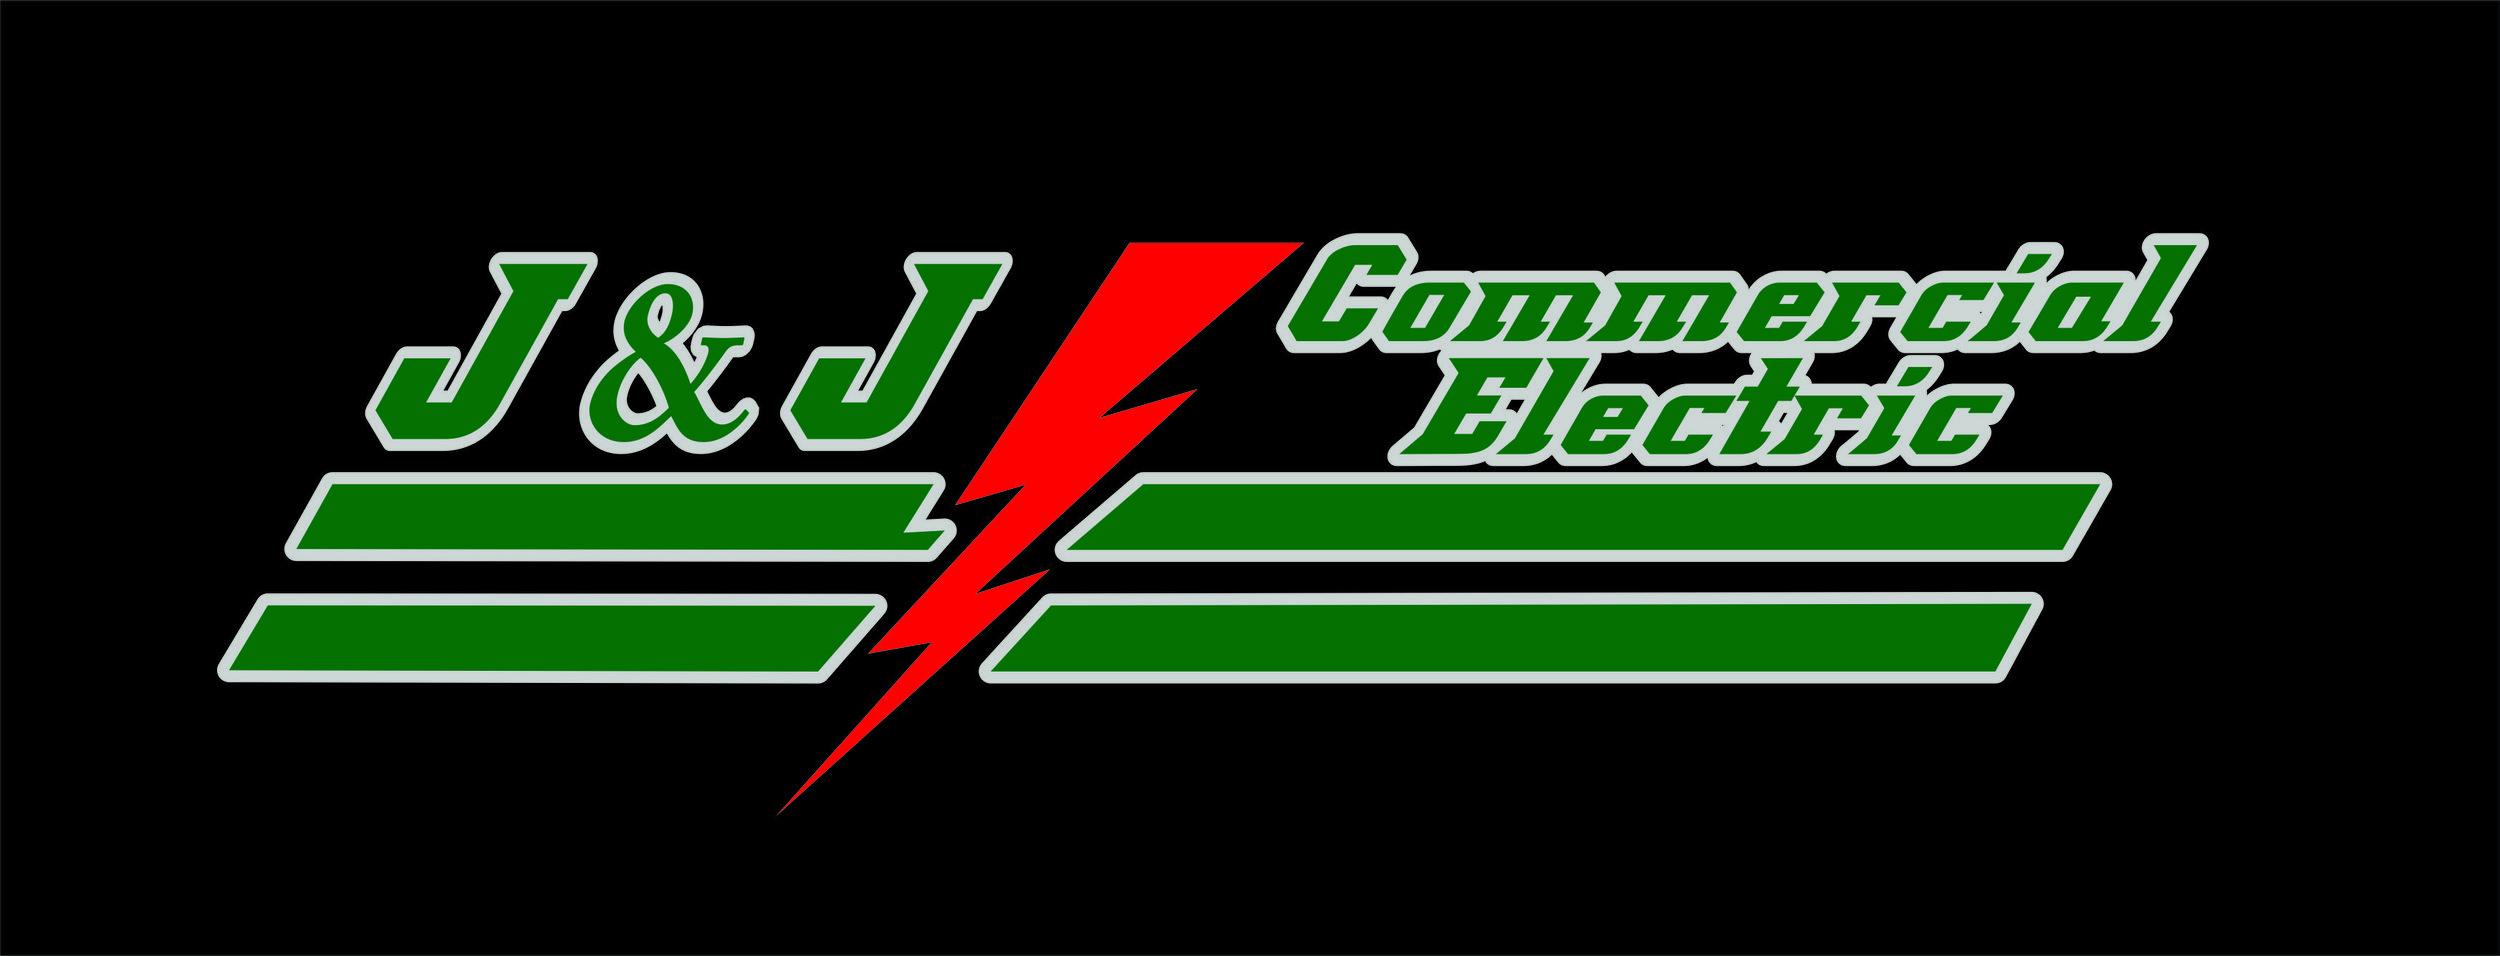 jj electric